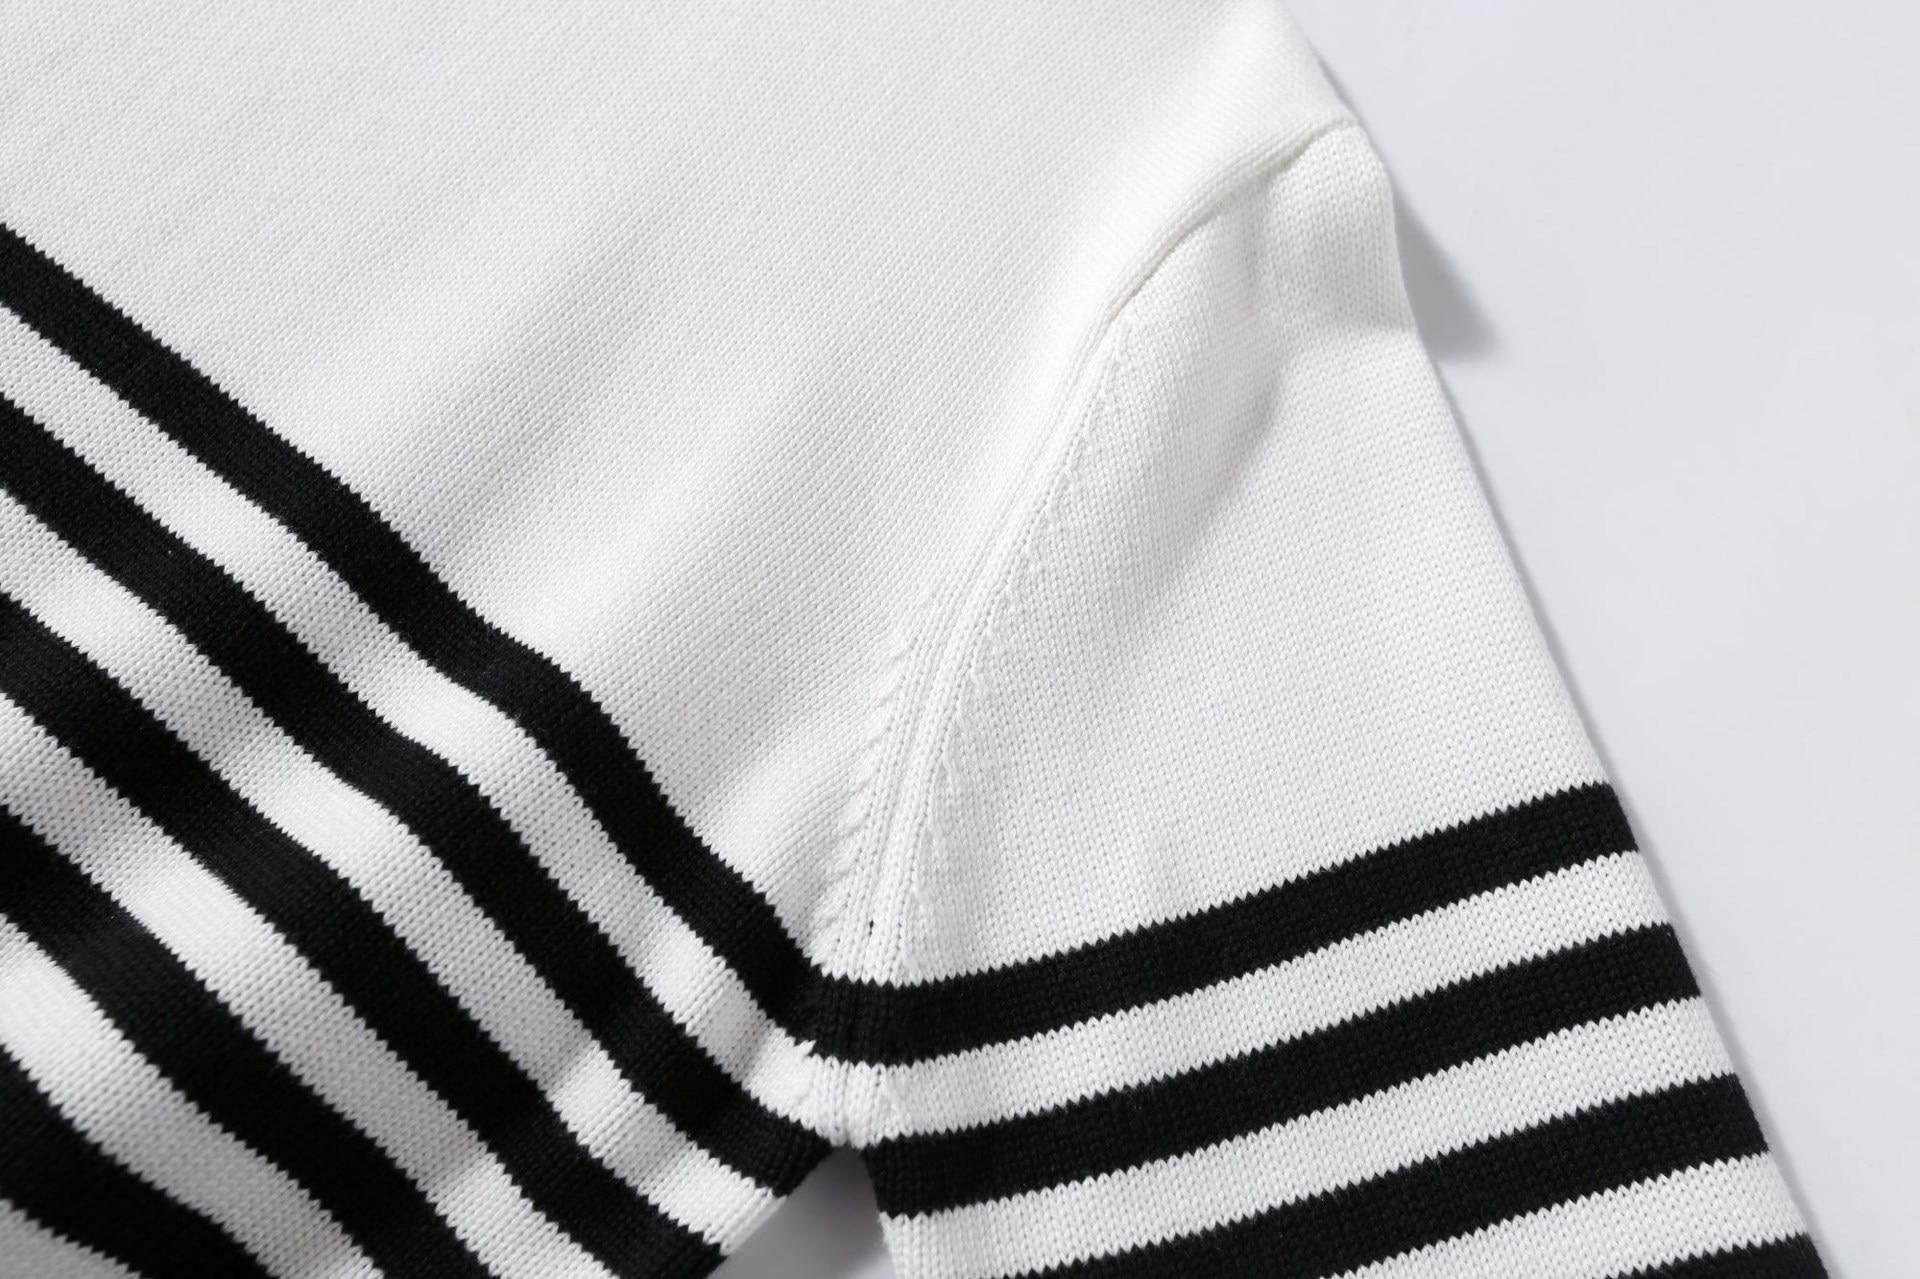 Cardigans Kpop Bts Bangtan Boys Jungkook Same Paragraph Men And Women Stripe Turtleneck Sweater Harajuku Coat Korean Clothes Streetwear